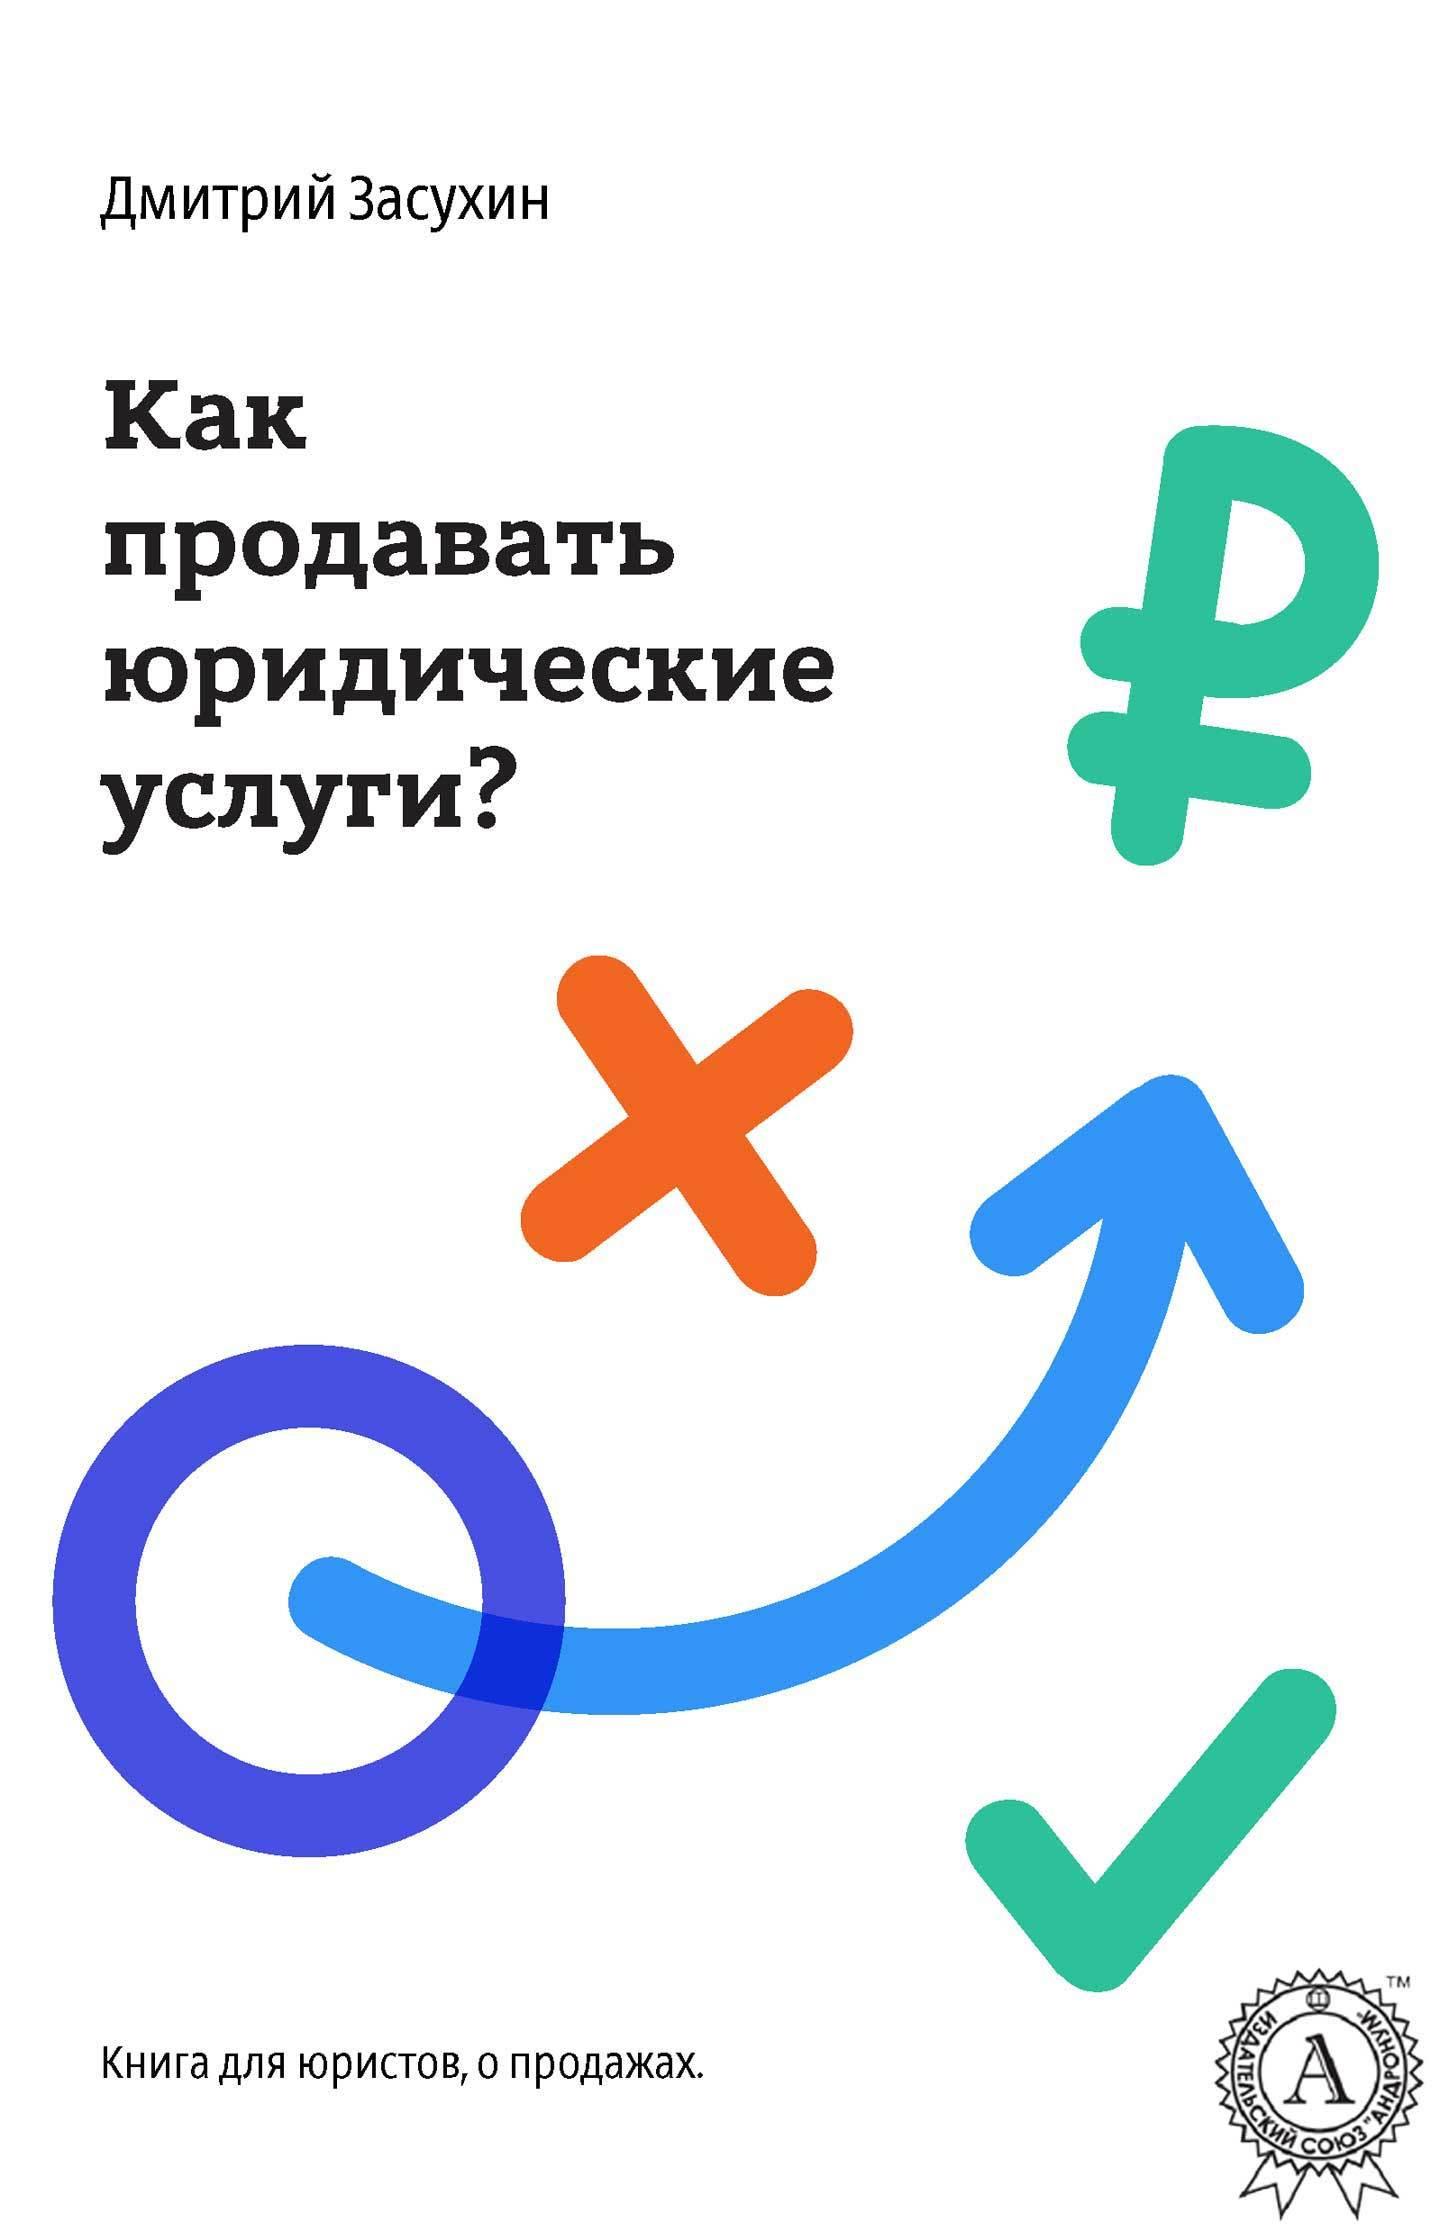 Дмитрий Засухин Юридический маркетинг. Как продавать юридические услуги? дмитрий засухин как сделать юридический сайт продающим